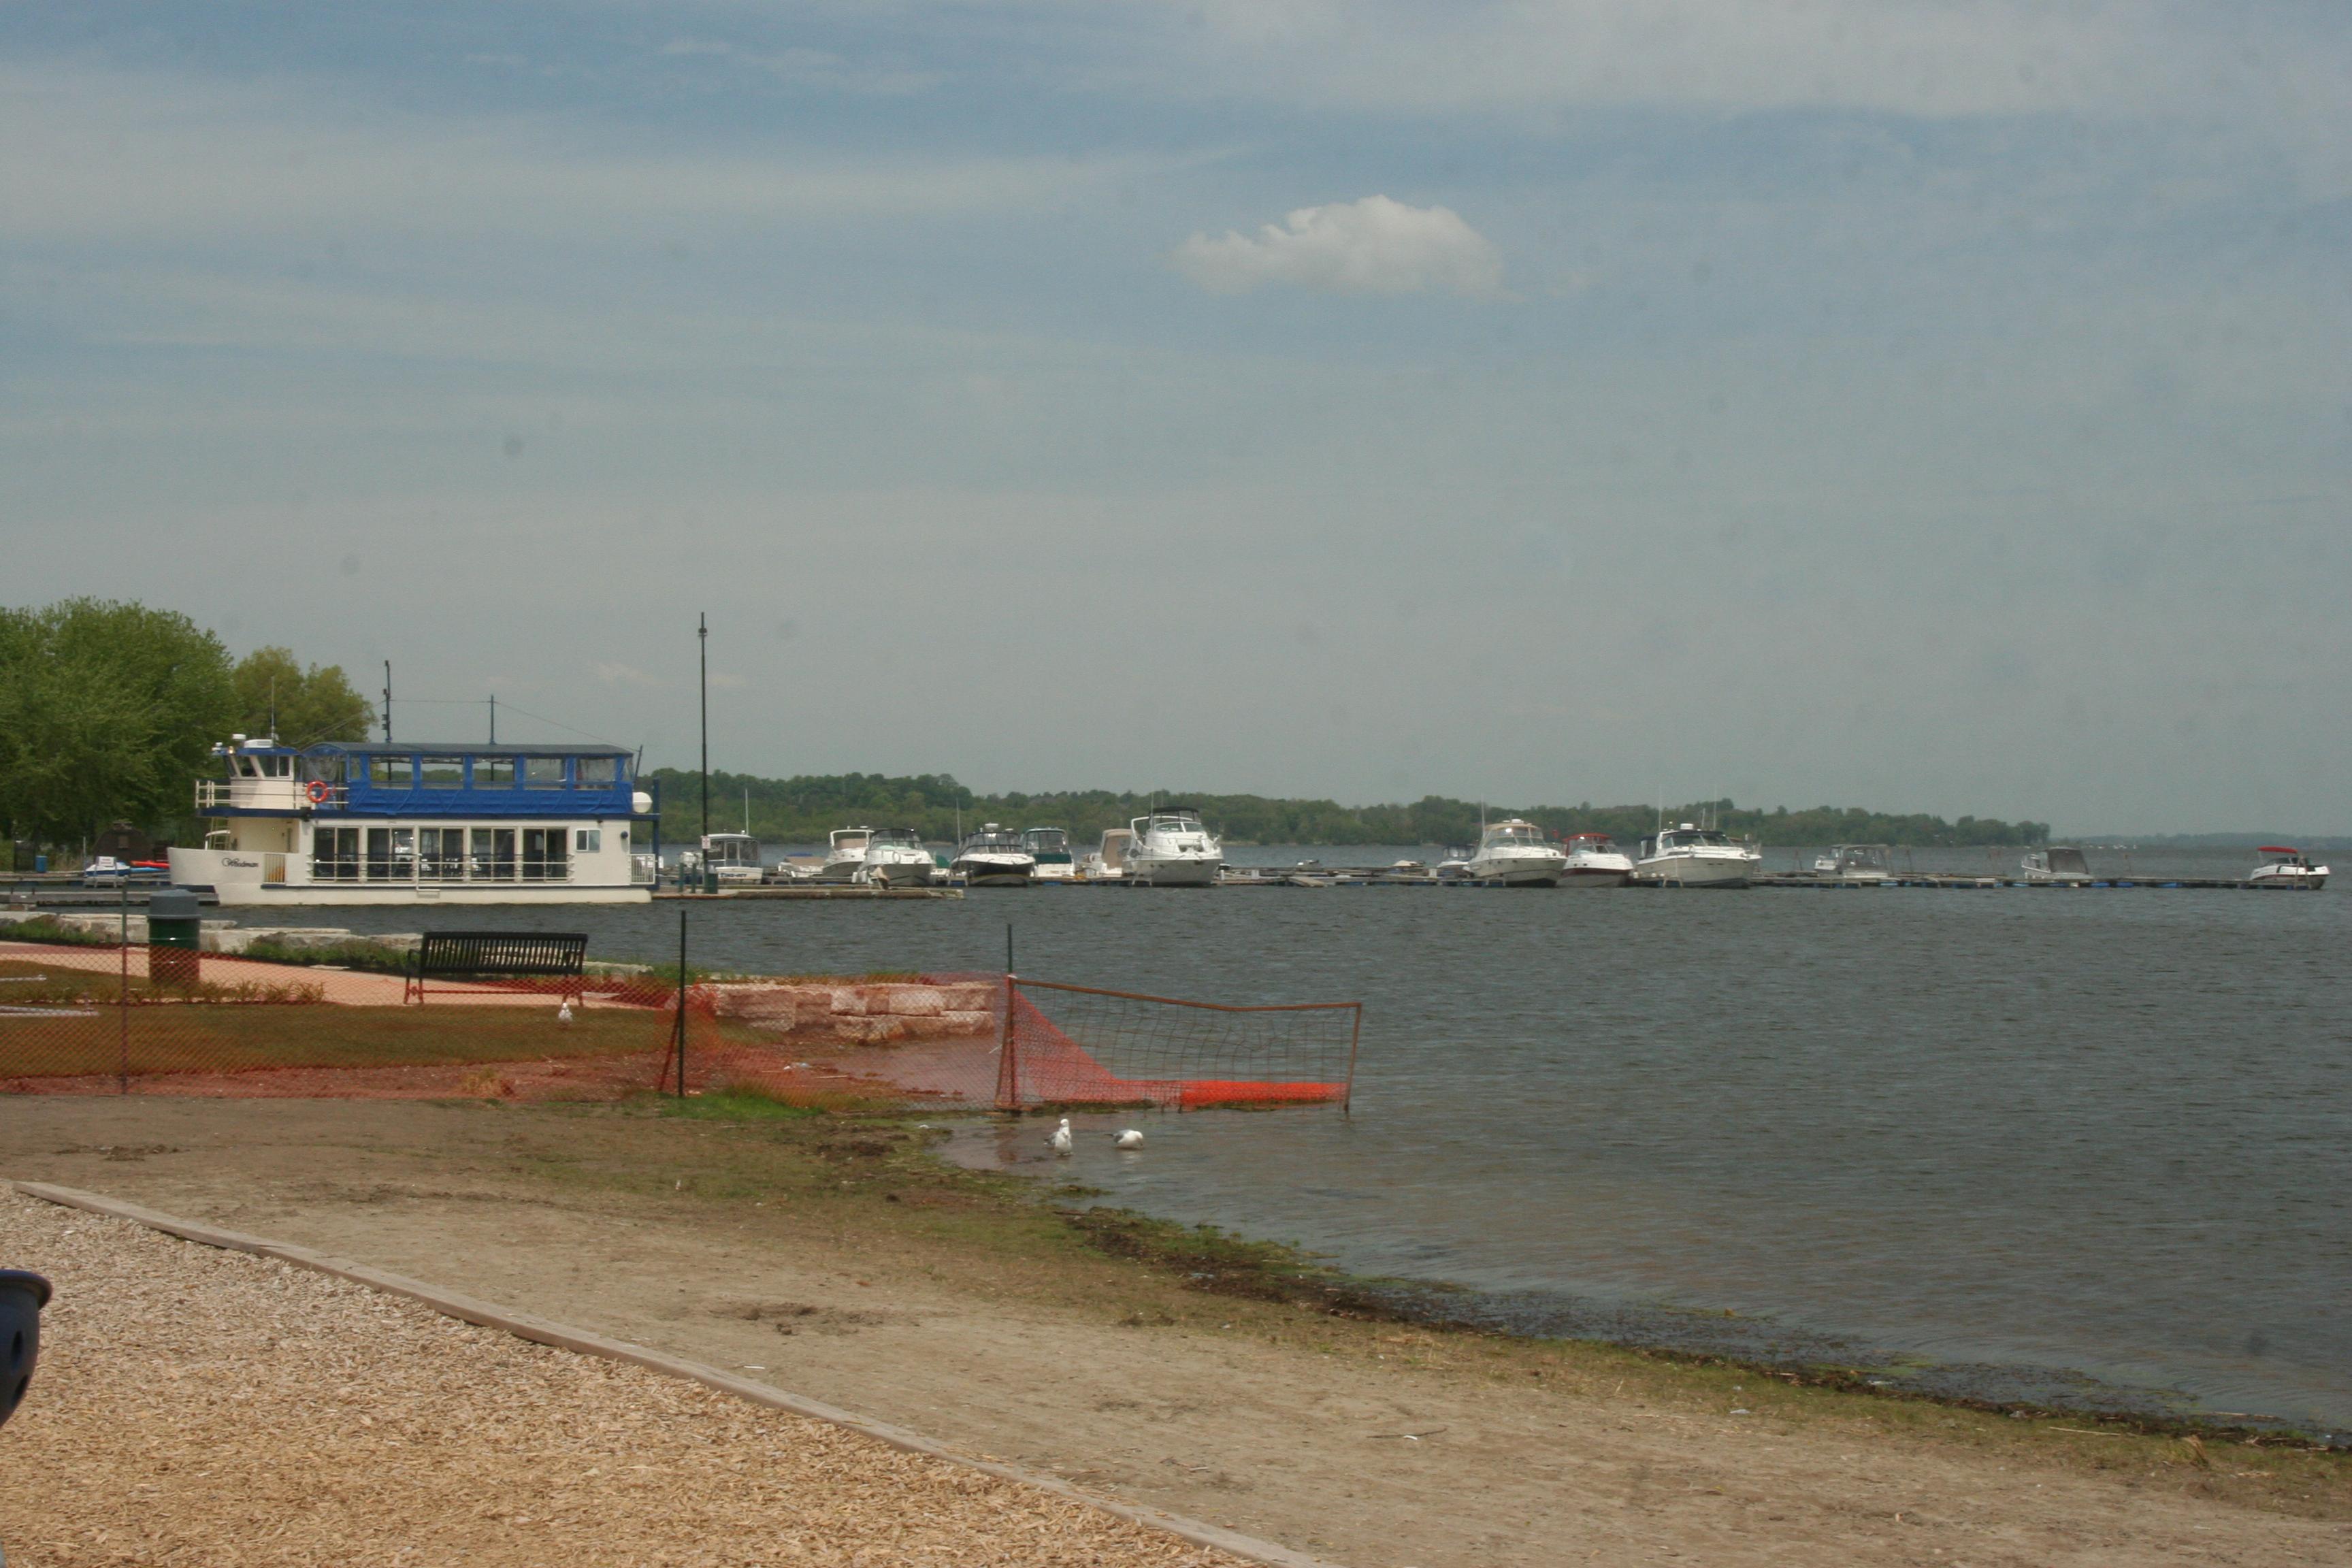 фото порт перри пляжи на озере заказа его